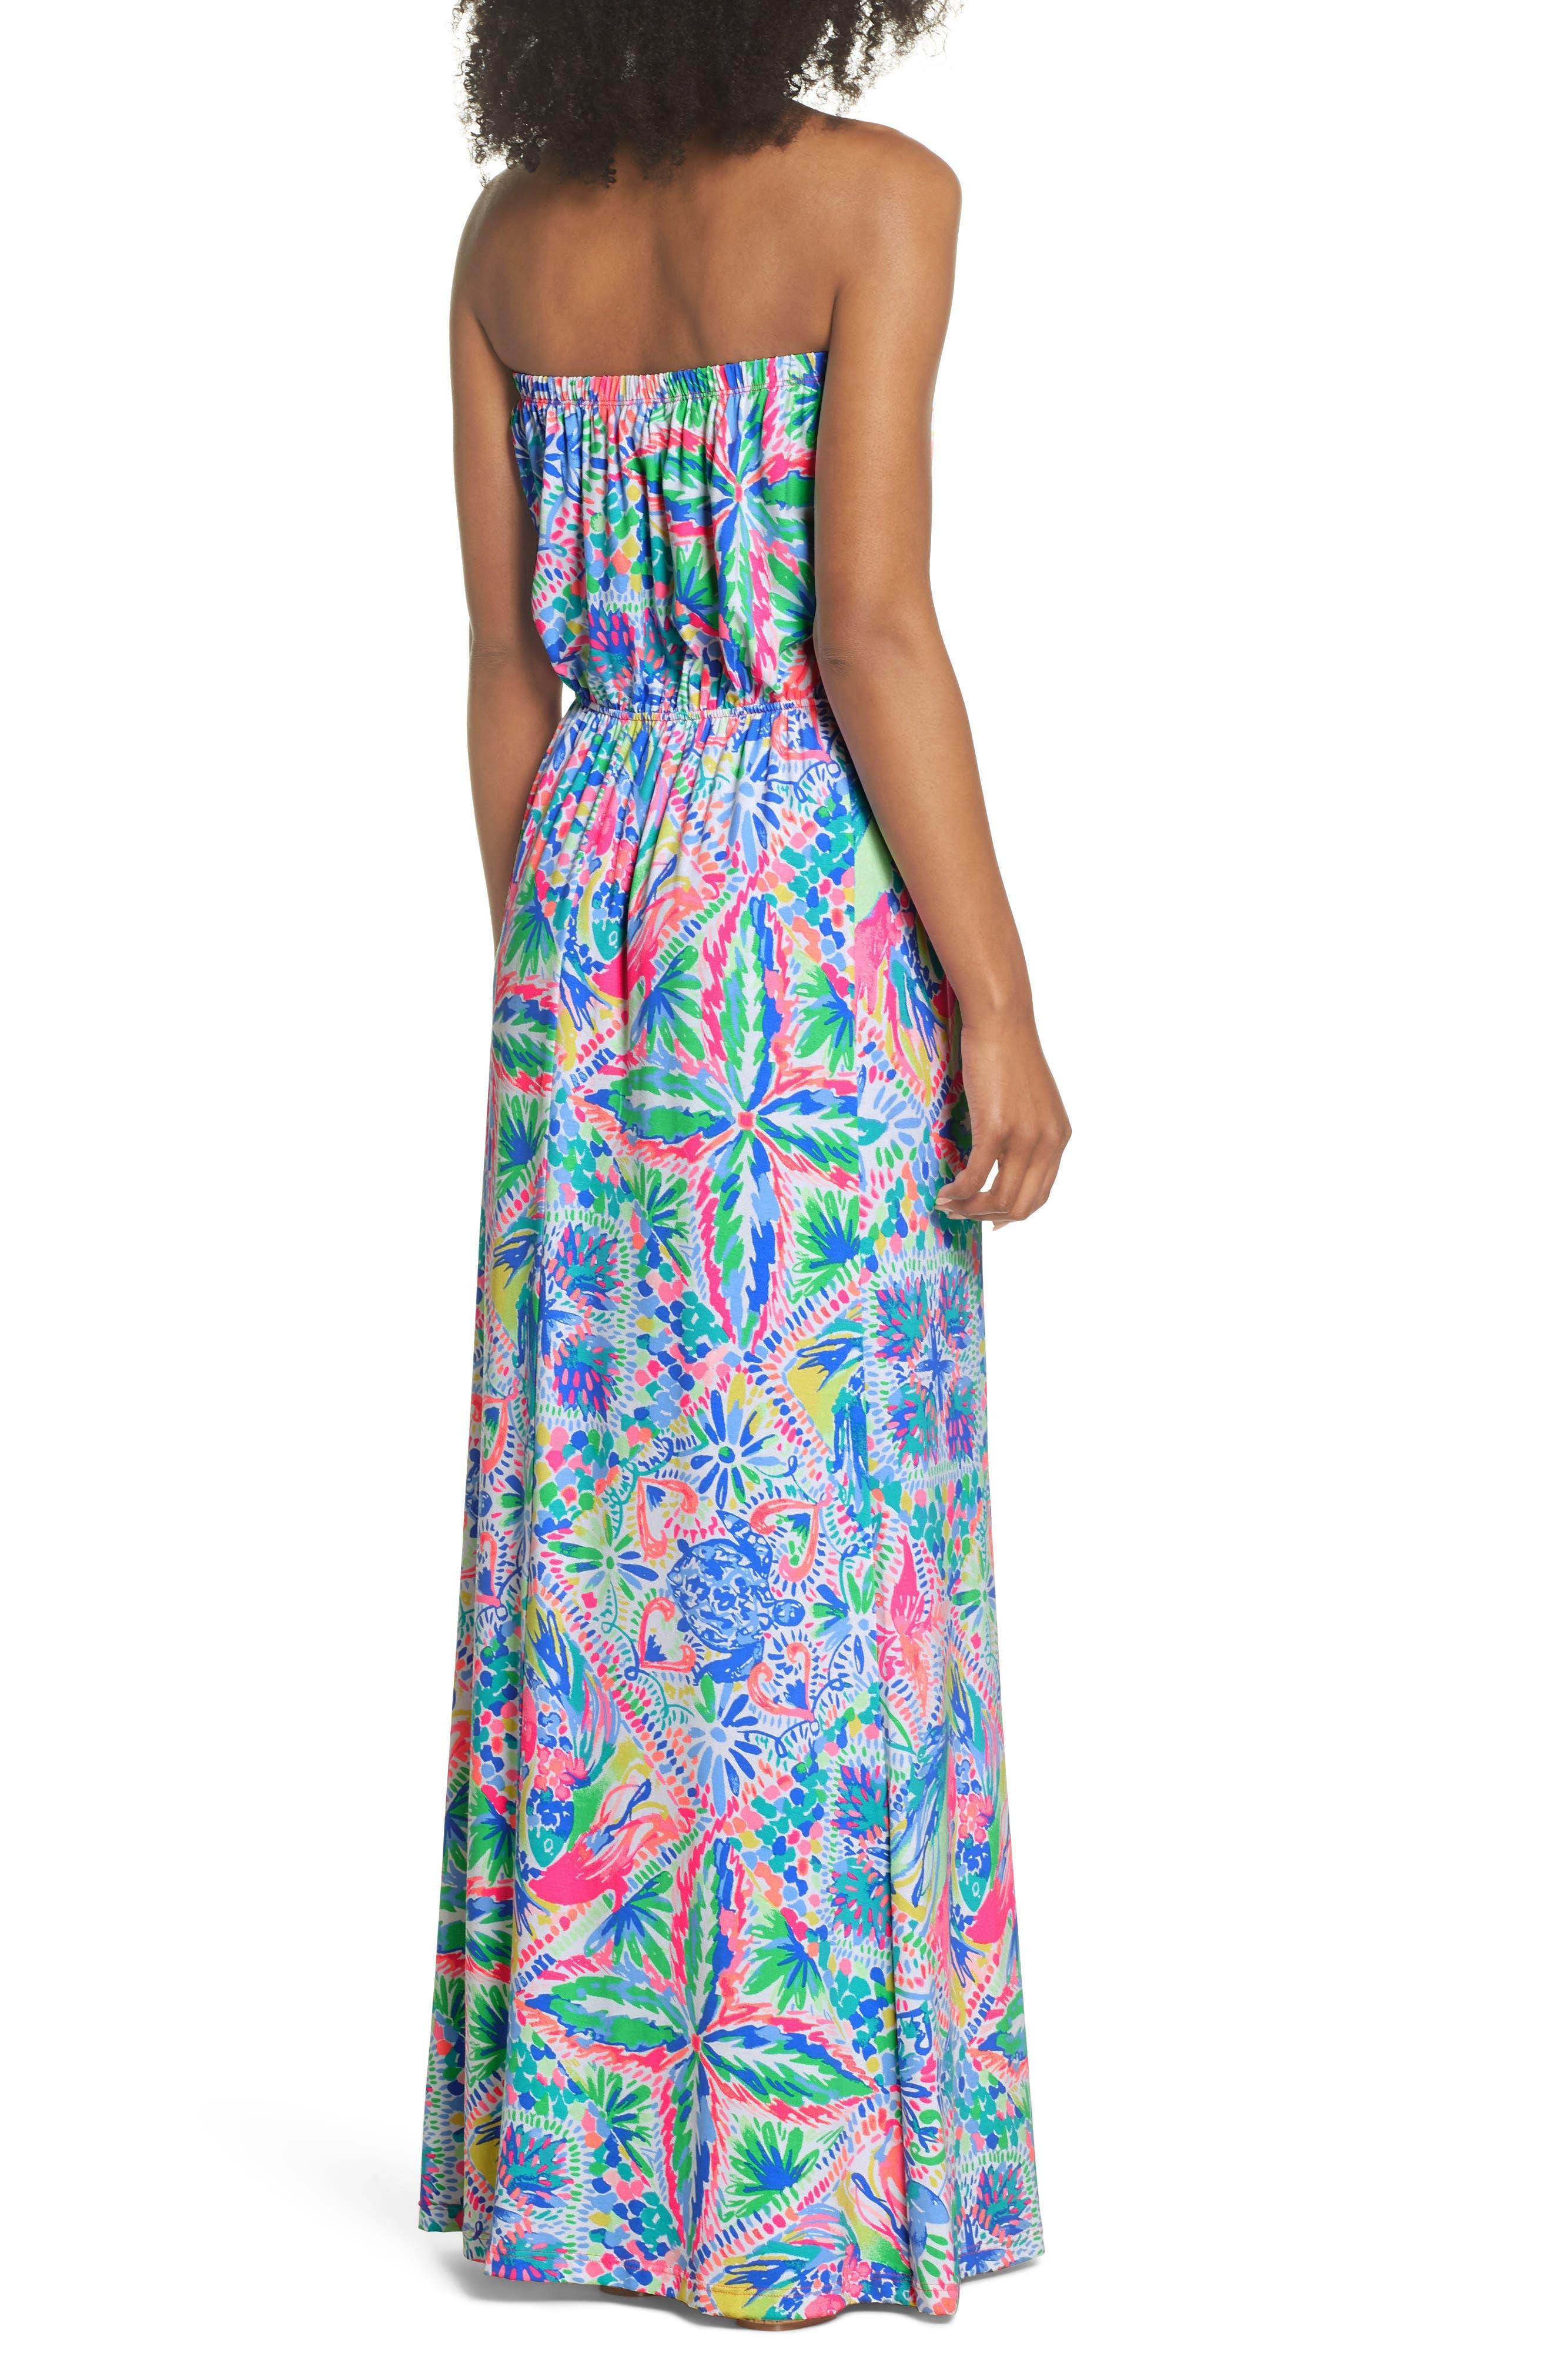 Marlisa Maxi Dress,                             Alternate thumbnail 2, color,                             MULTI DANCING ON THE DECK